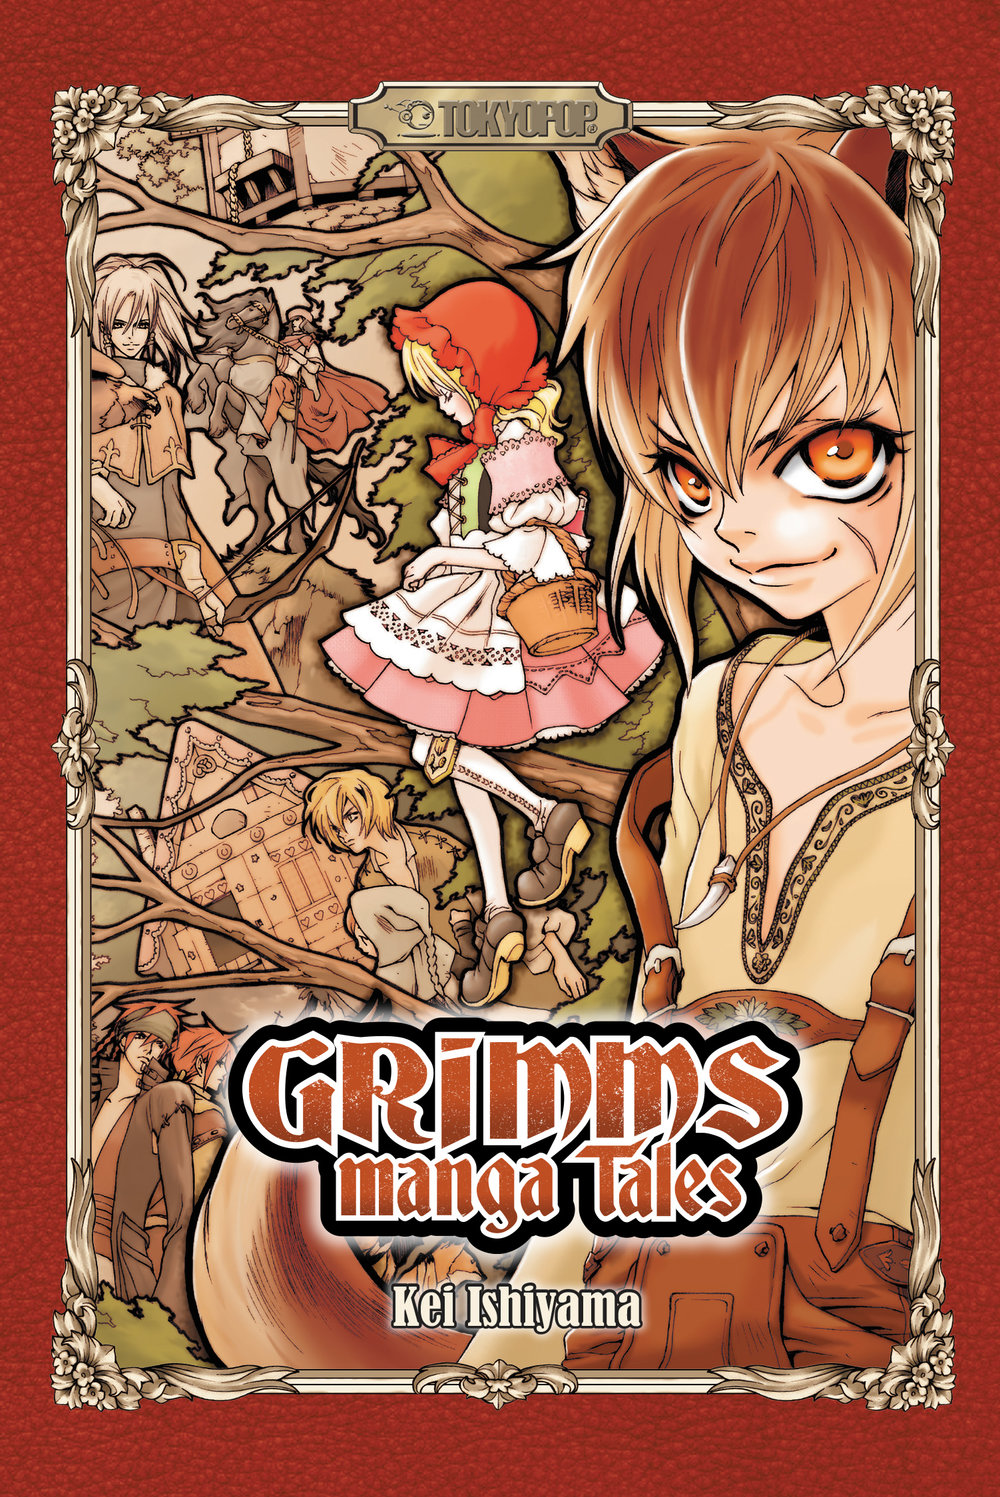 Grimms Manga Tales (print version)